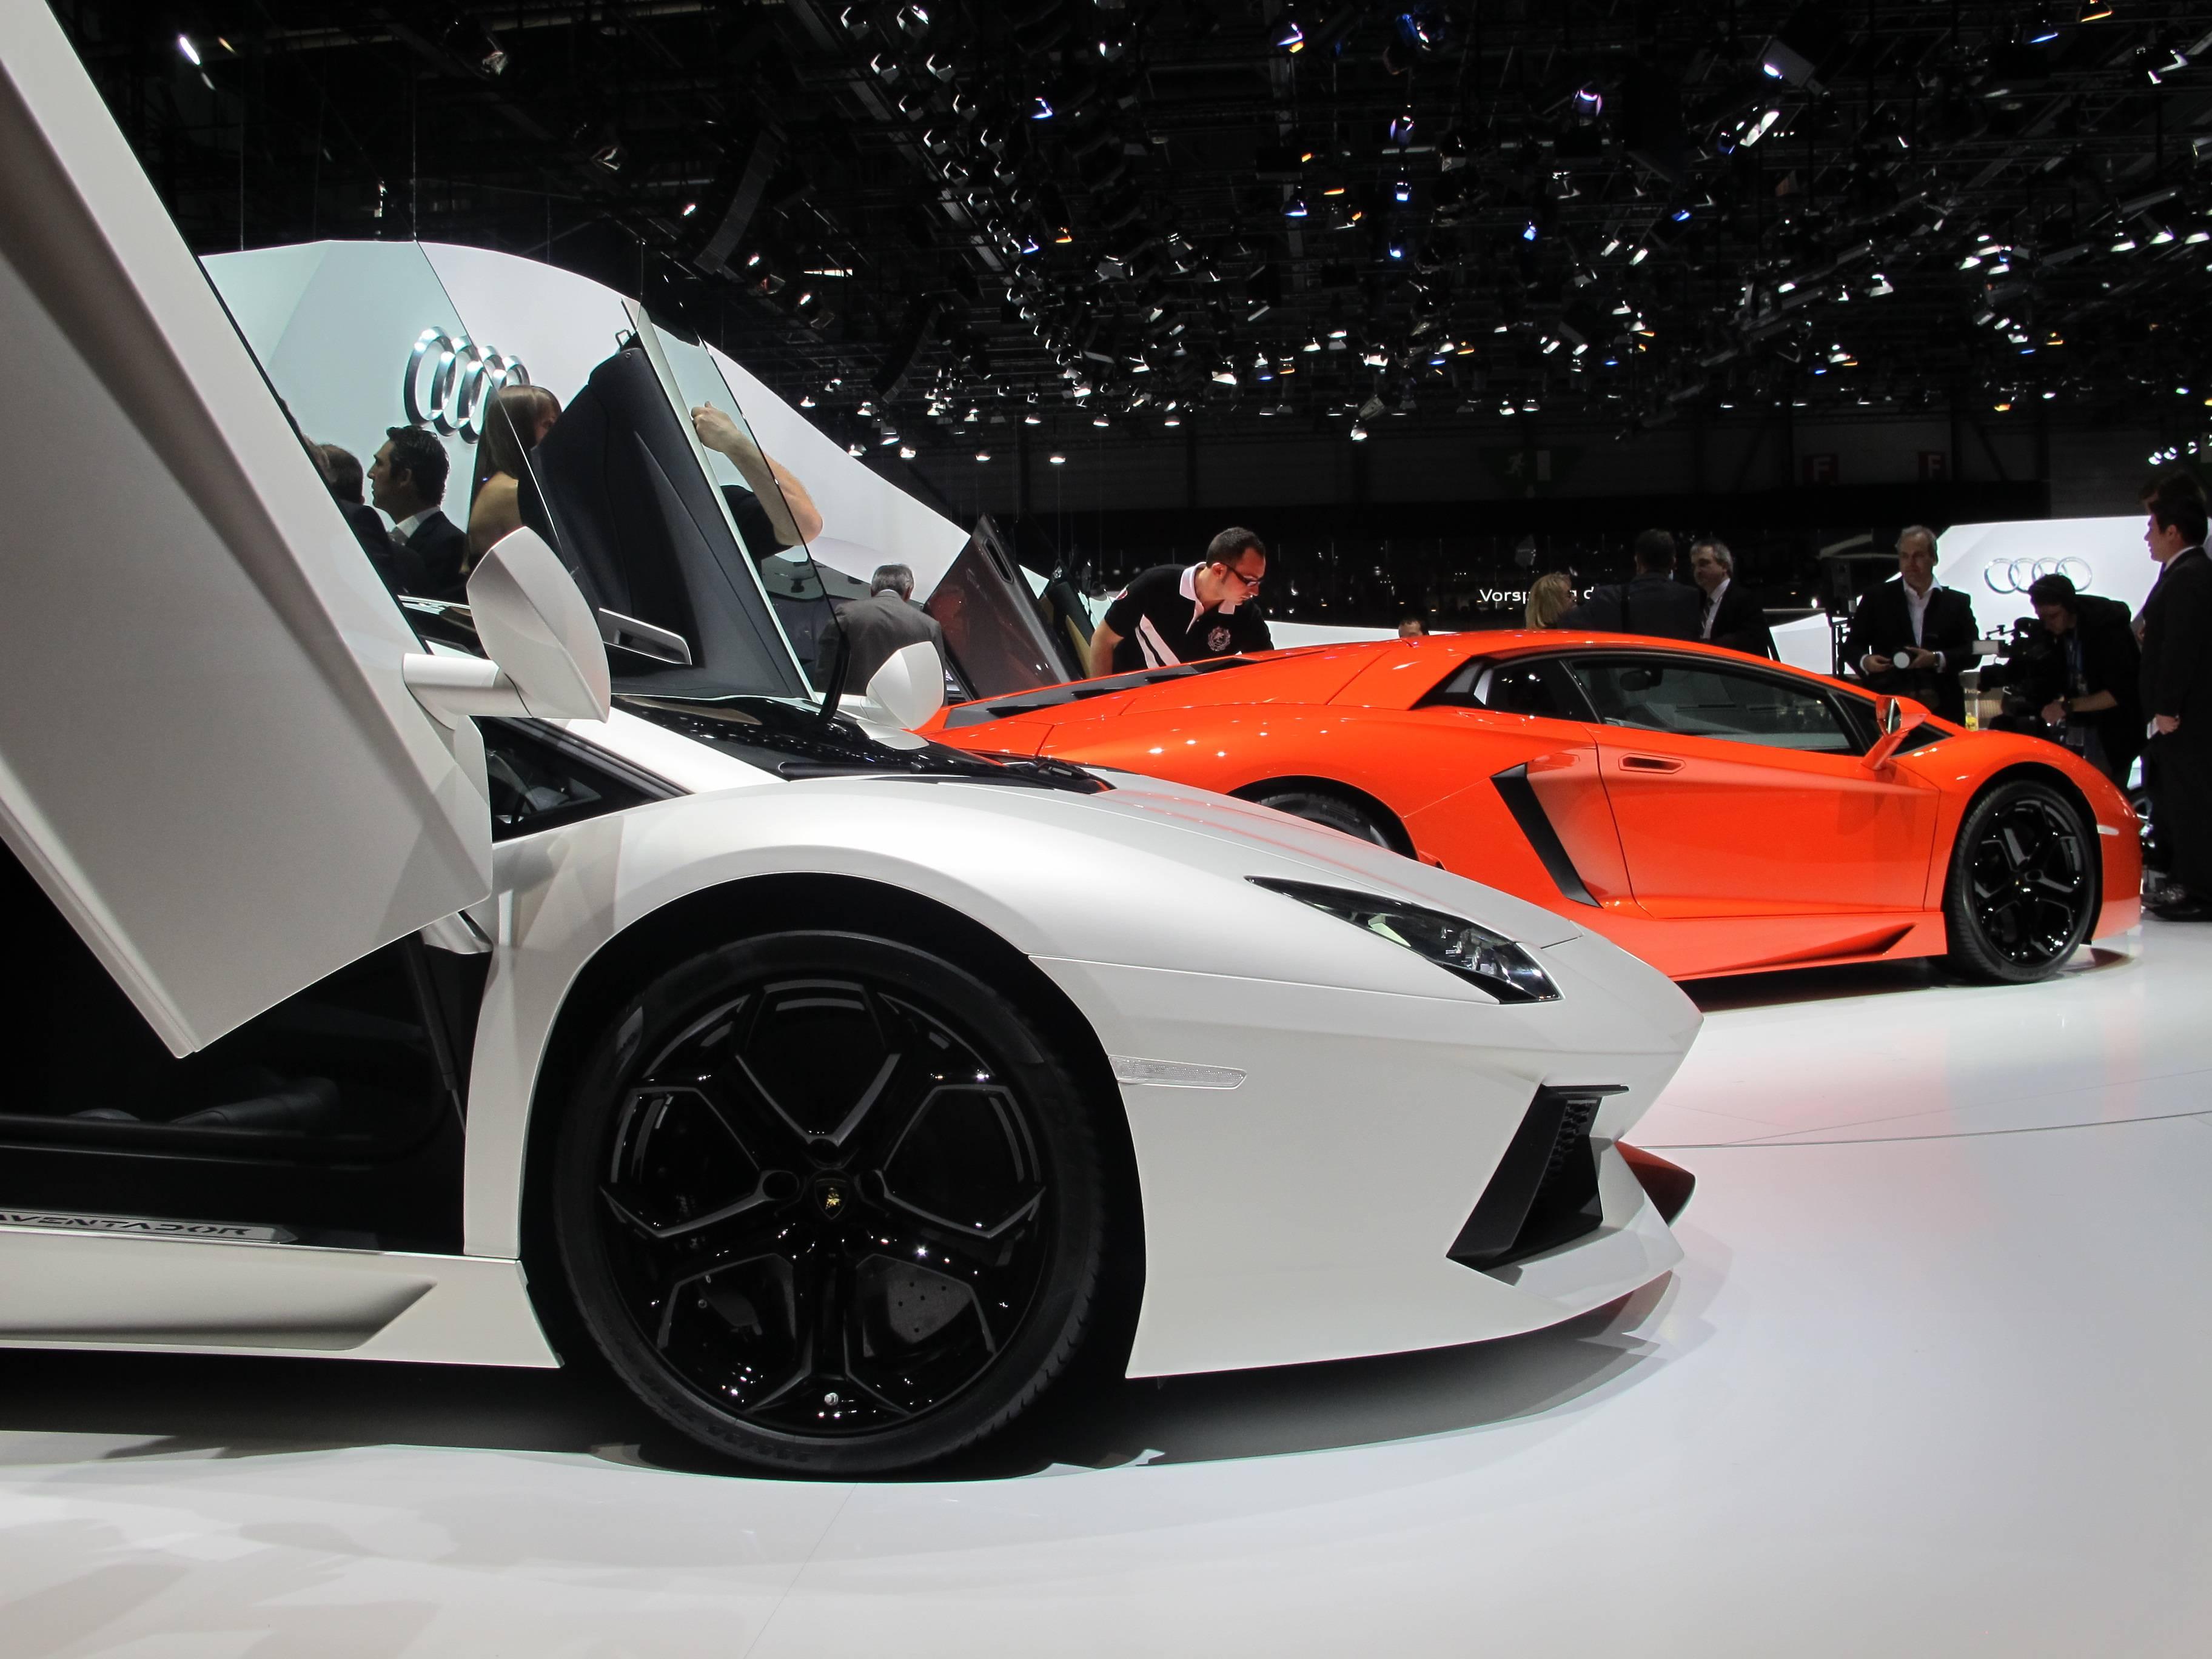 Geneva Motor Show-Lamborghini Aventador LP 700-4